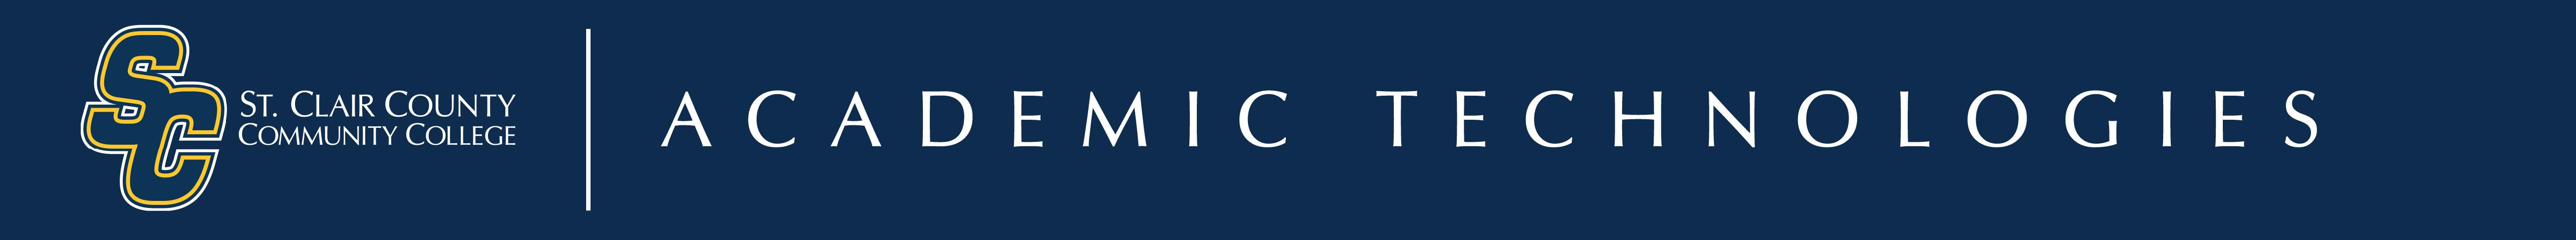 SC4 Academic Technologies Logo